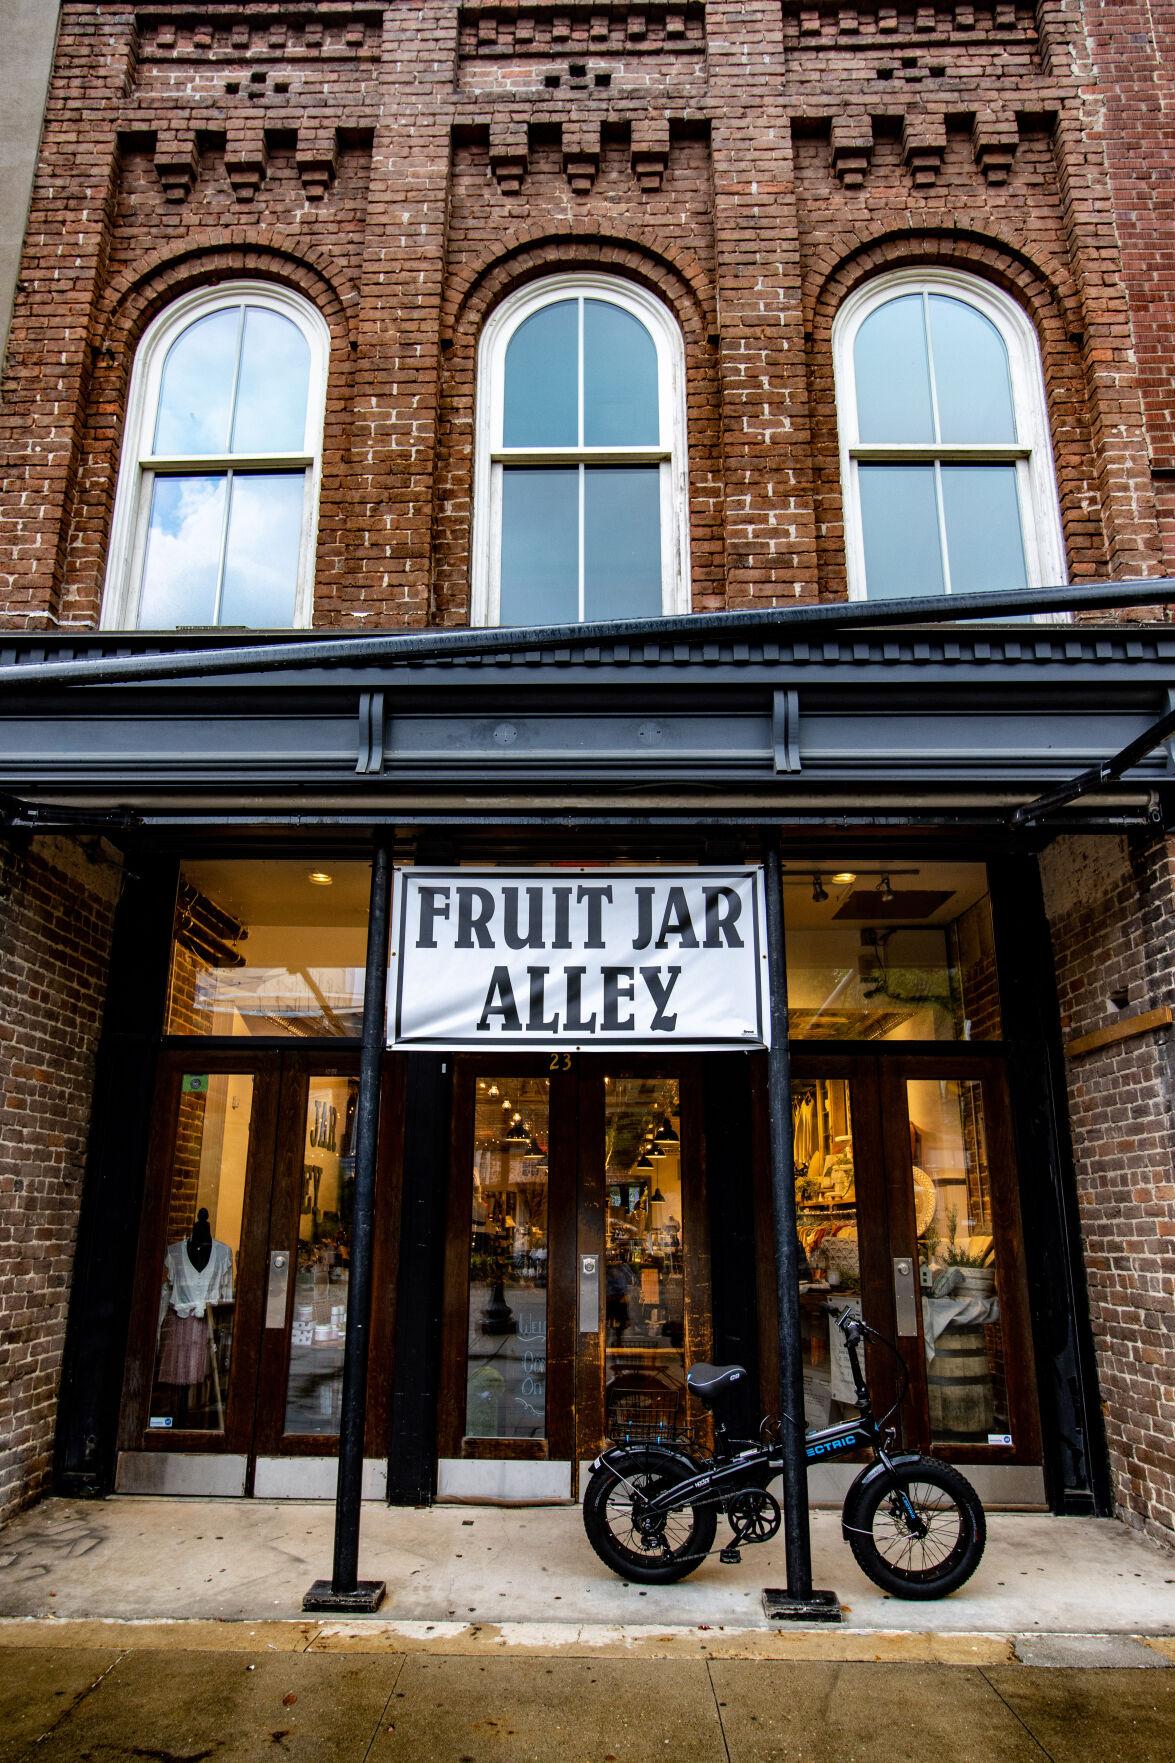 Fruit Jar Alley Exterior